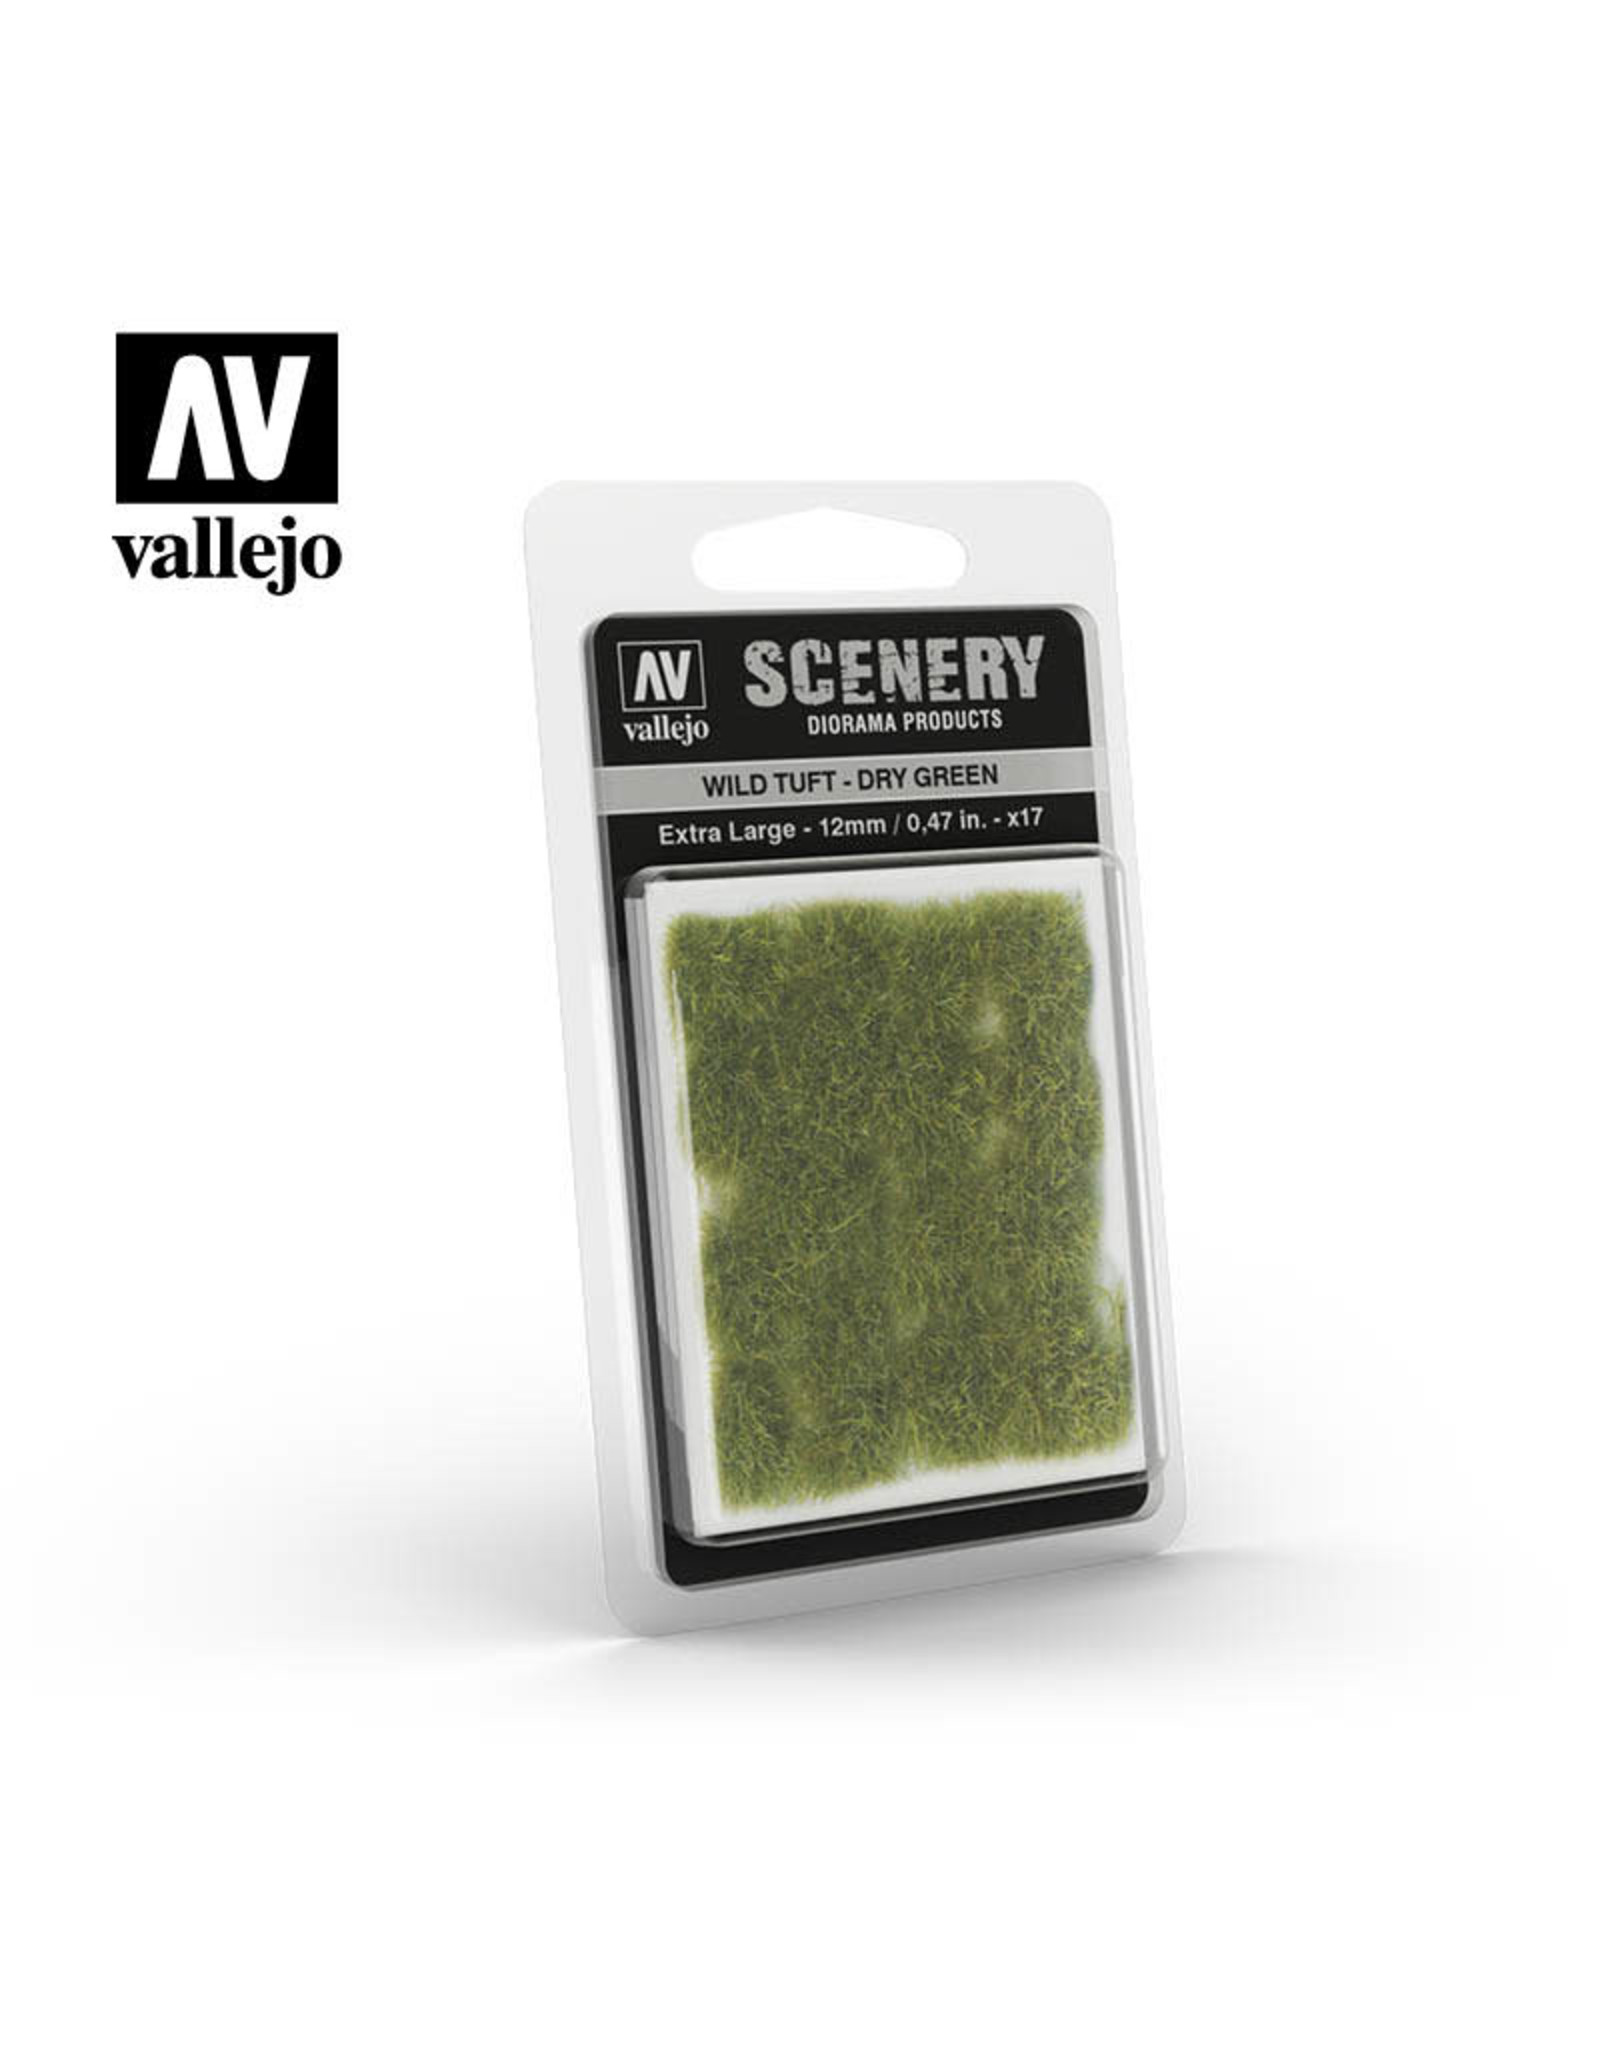 VALLEJO VALLEJO WILD TUFT DRY GREEN EXTRA LARGE